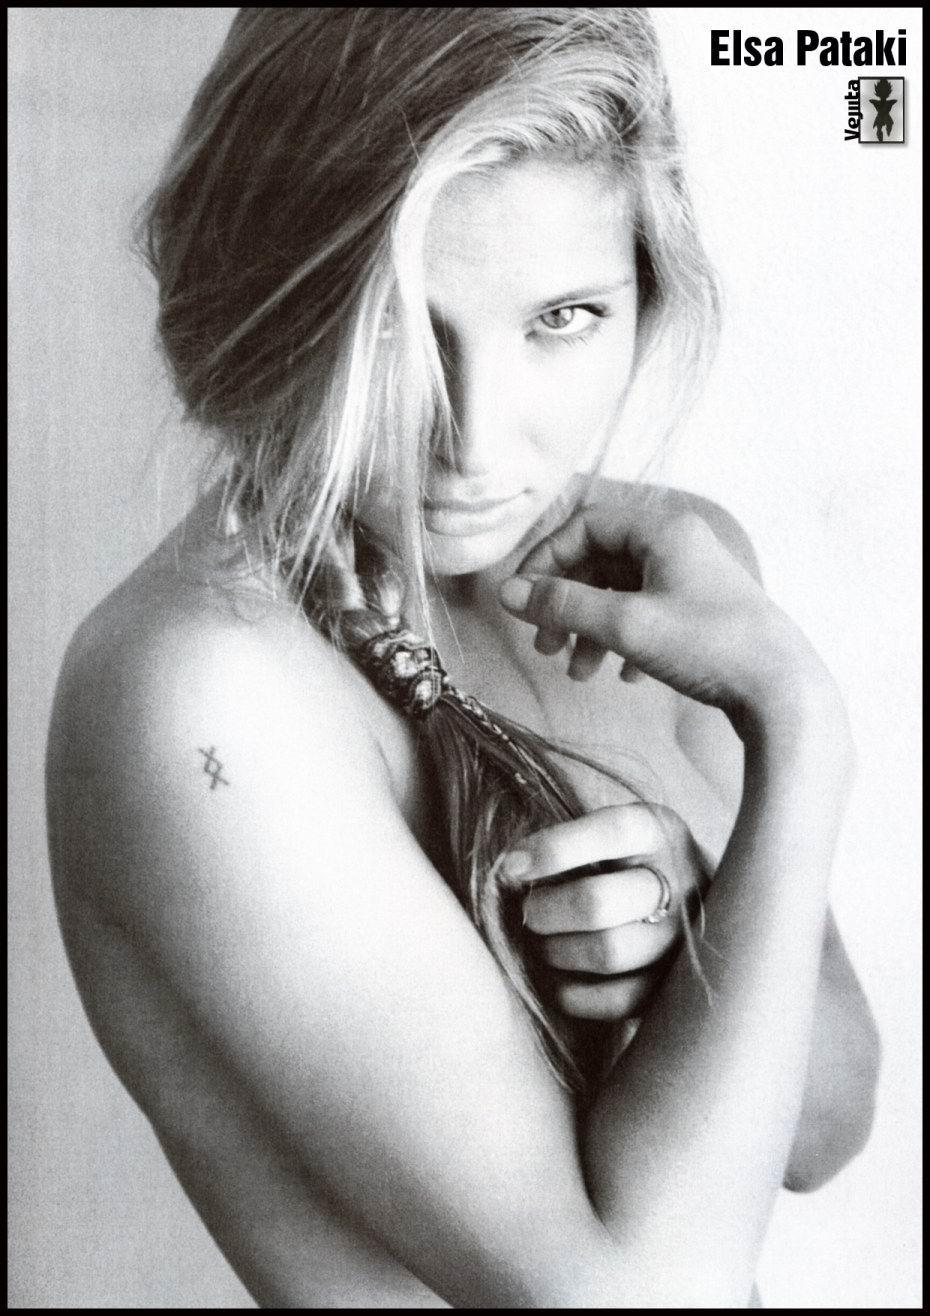 fotos de Elsa Pataky desnuda 2